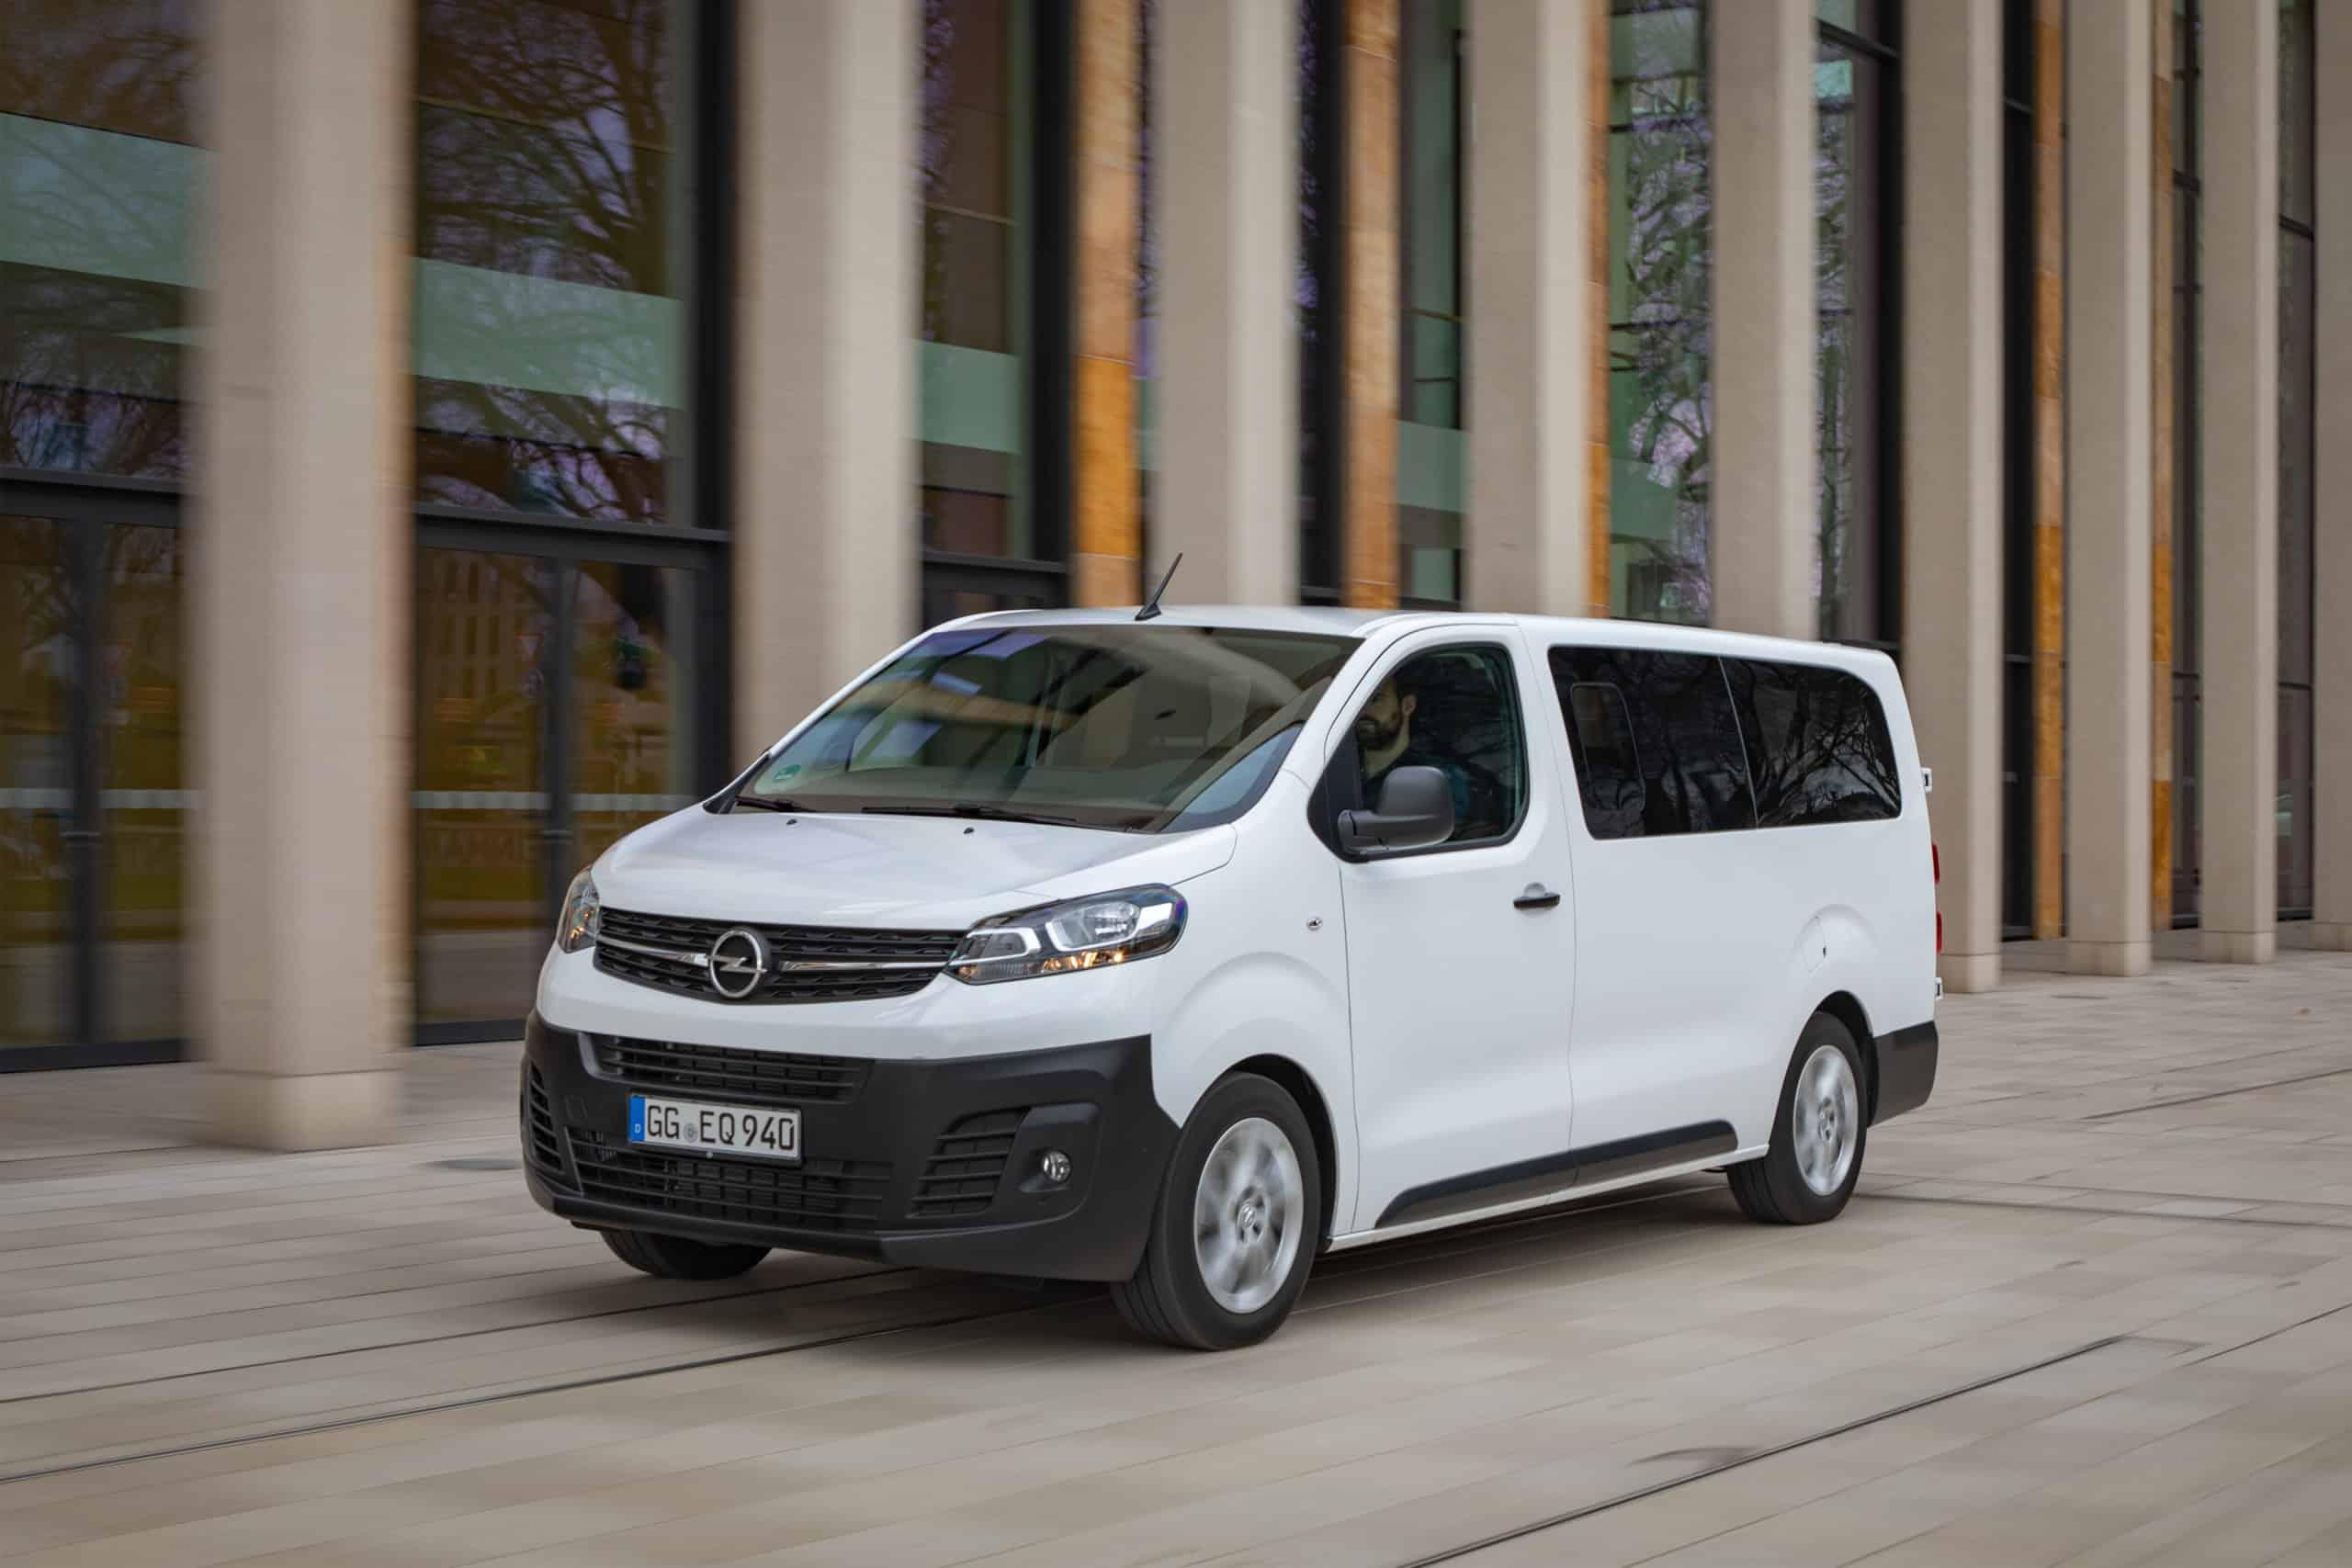 2020 Opel Vivaro Prices